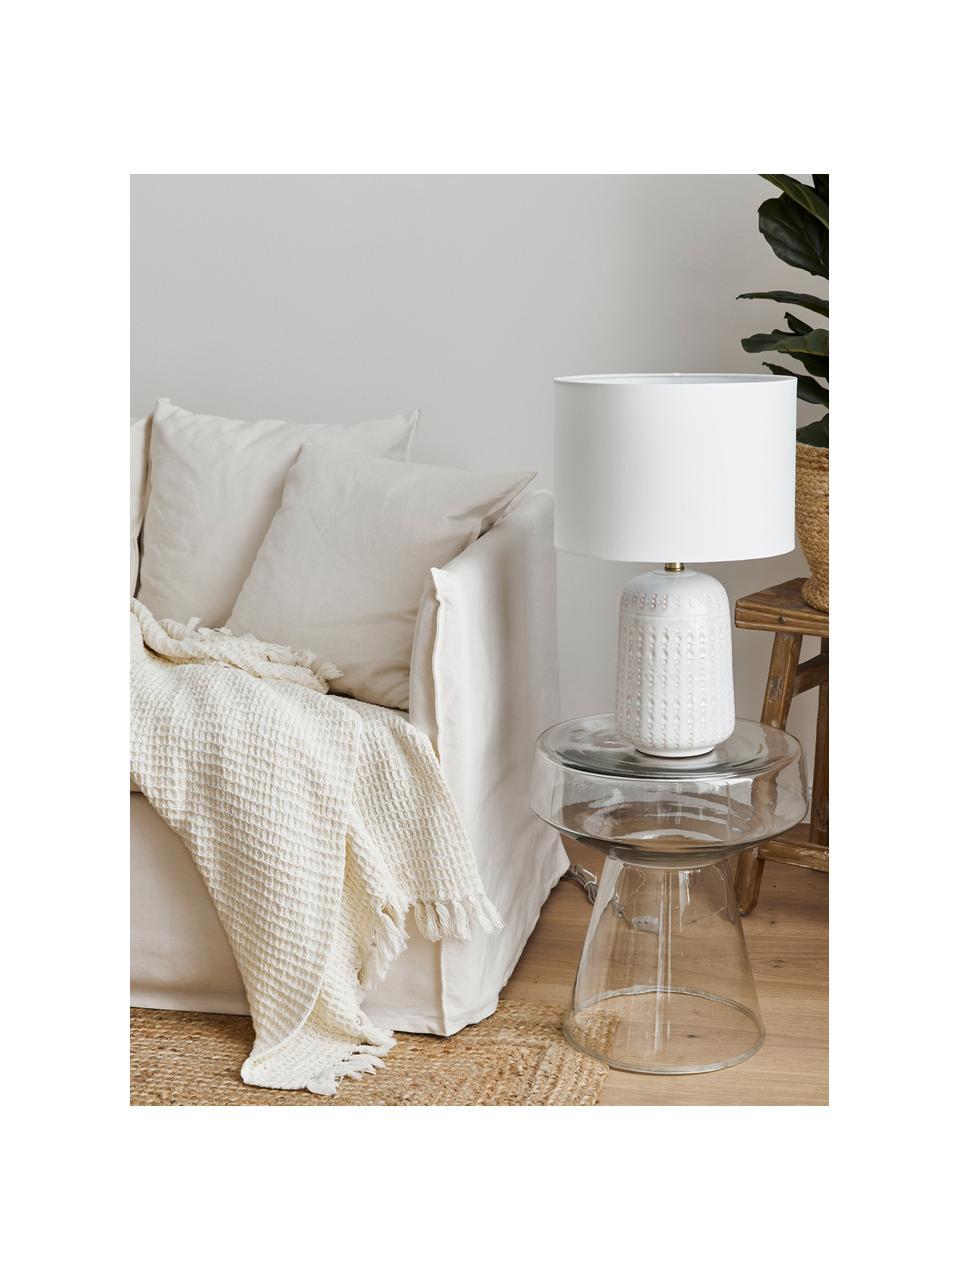 Große Keramik-Tischlampe Iva, Lampenschirm: Textil, Lampenfuß: Keramik, Lampenschirm: WeißLampenfuß: Cremeweiß, Messing, Ø 33 x H 53 cm